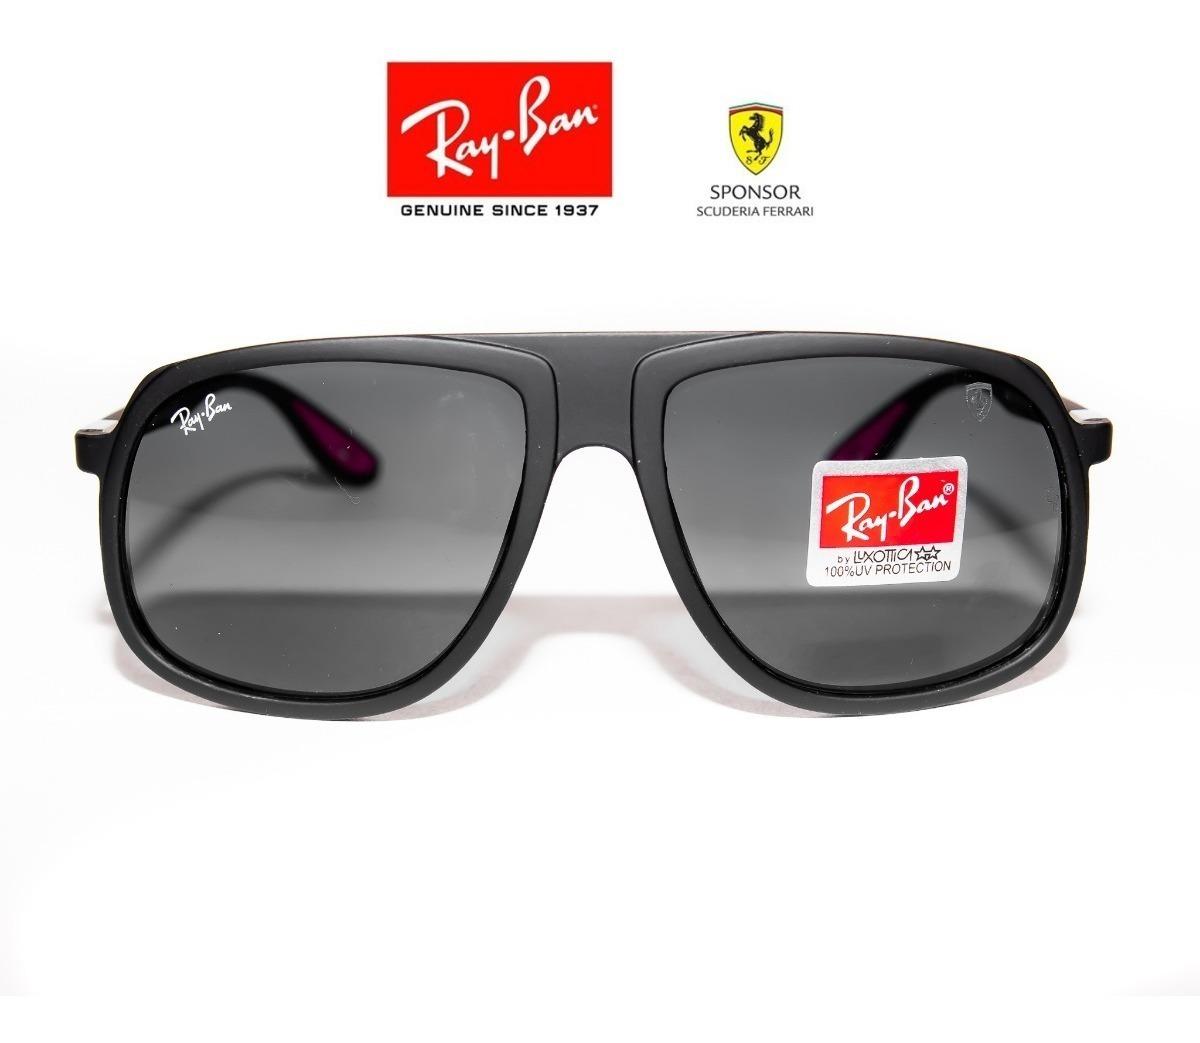 fbfd218eff Gafas Ray Ban Ferrari 4308 Negra - Unisex - Envio Gratis - $ 89.900 ...